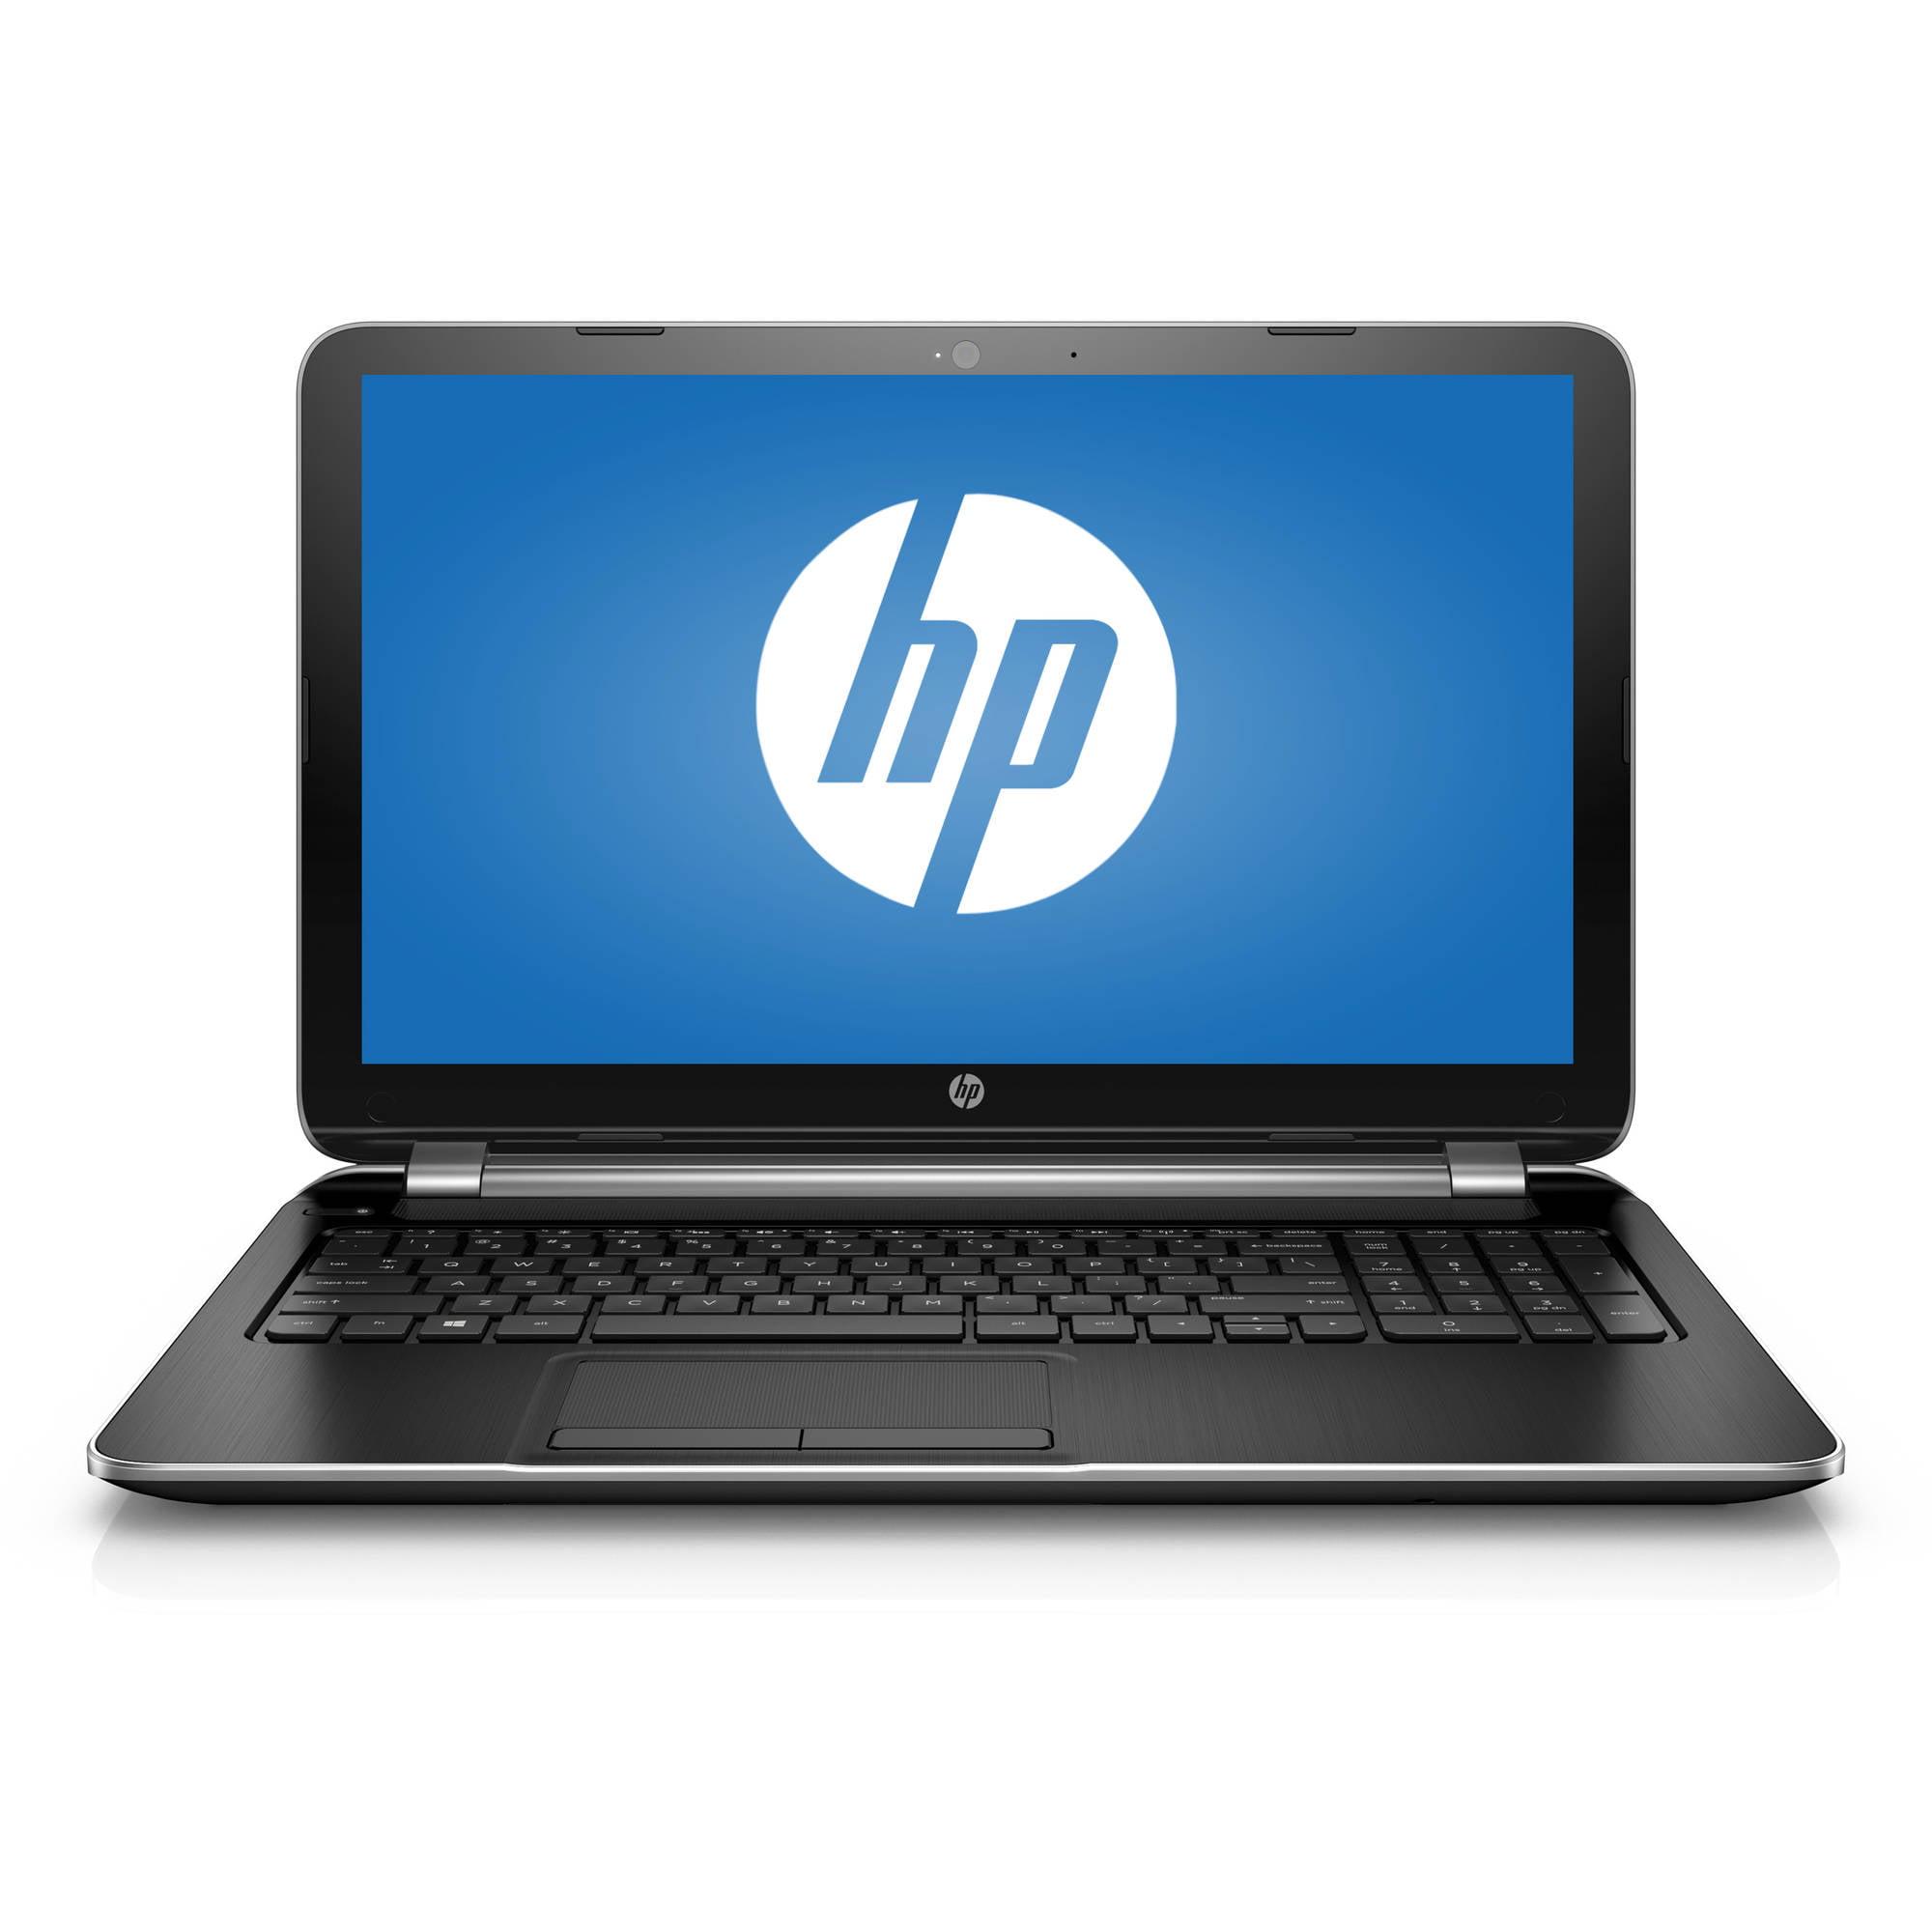 Notebook samsung 10 inch - Refurbished Hp Silver 15 6 15 F271wm Laptop Pc With Intel Pentium N3540 Quad